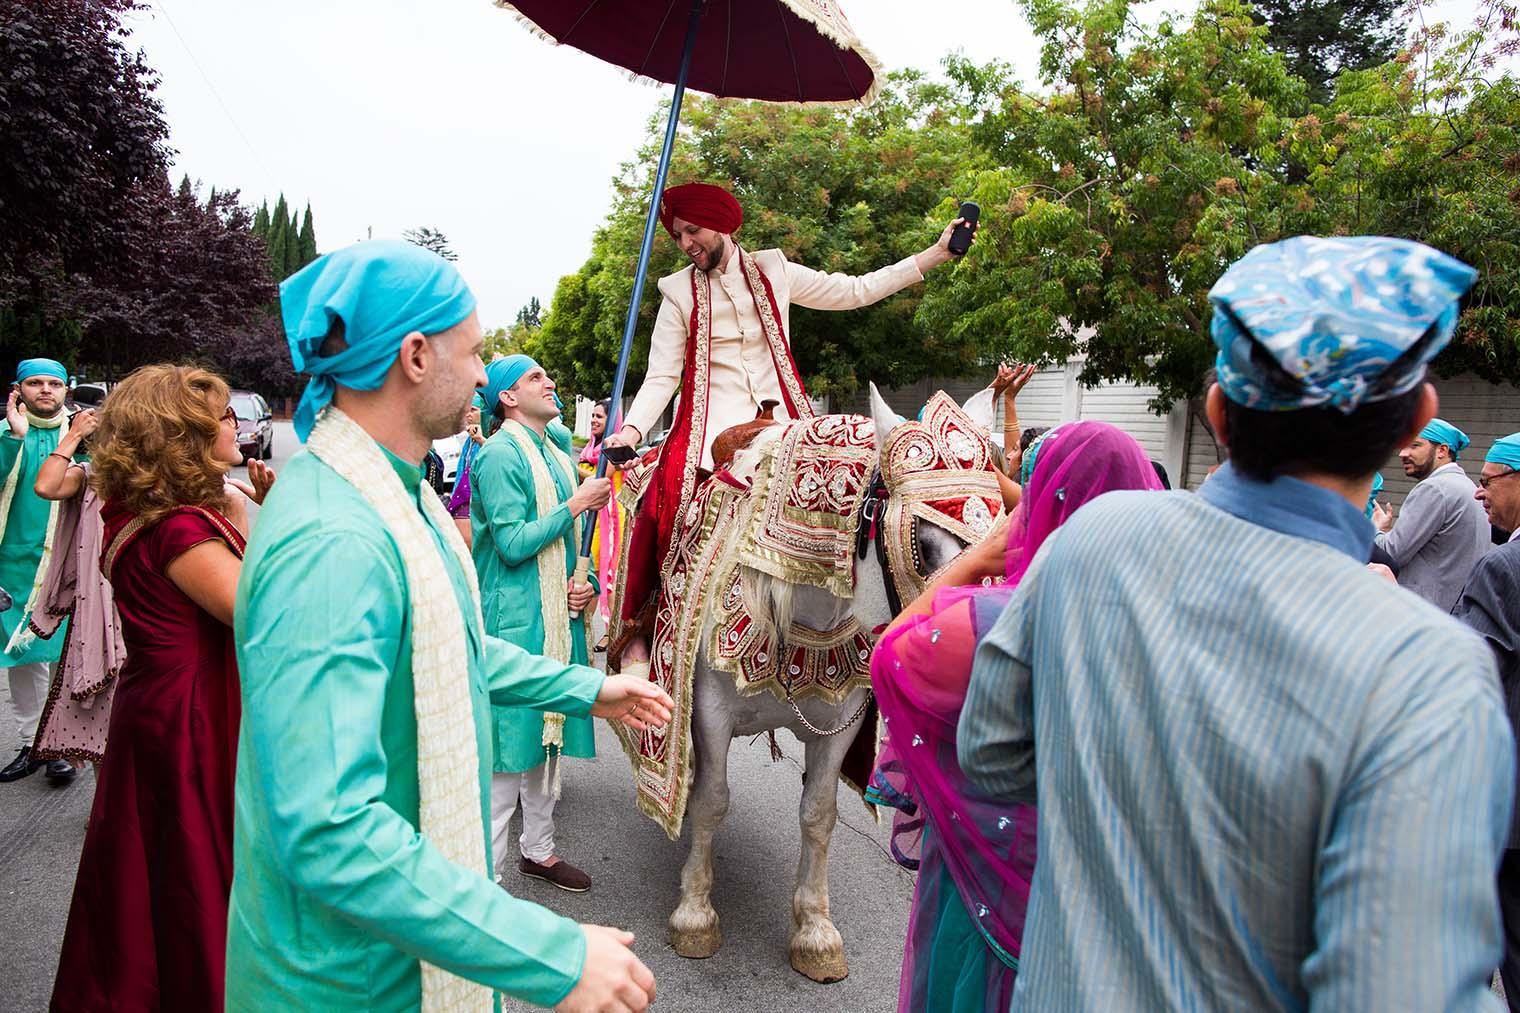 baraat procession at indian wedding